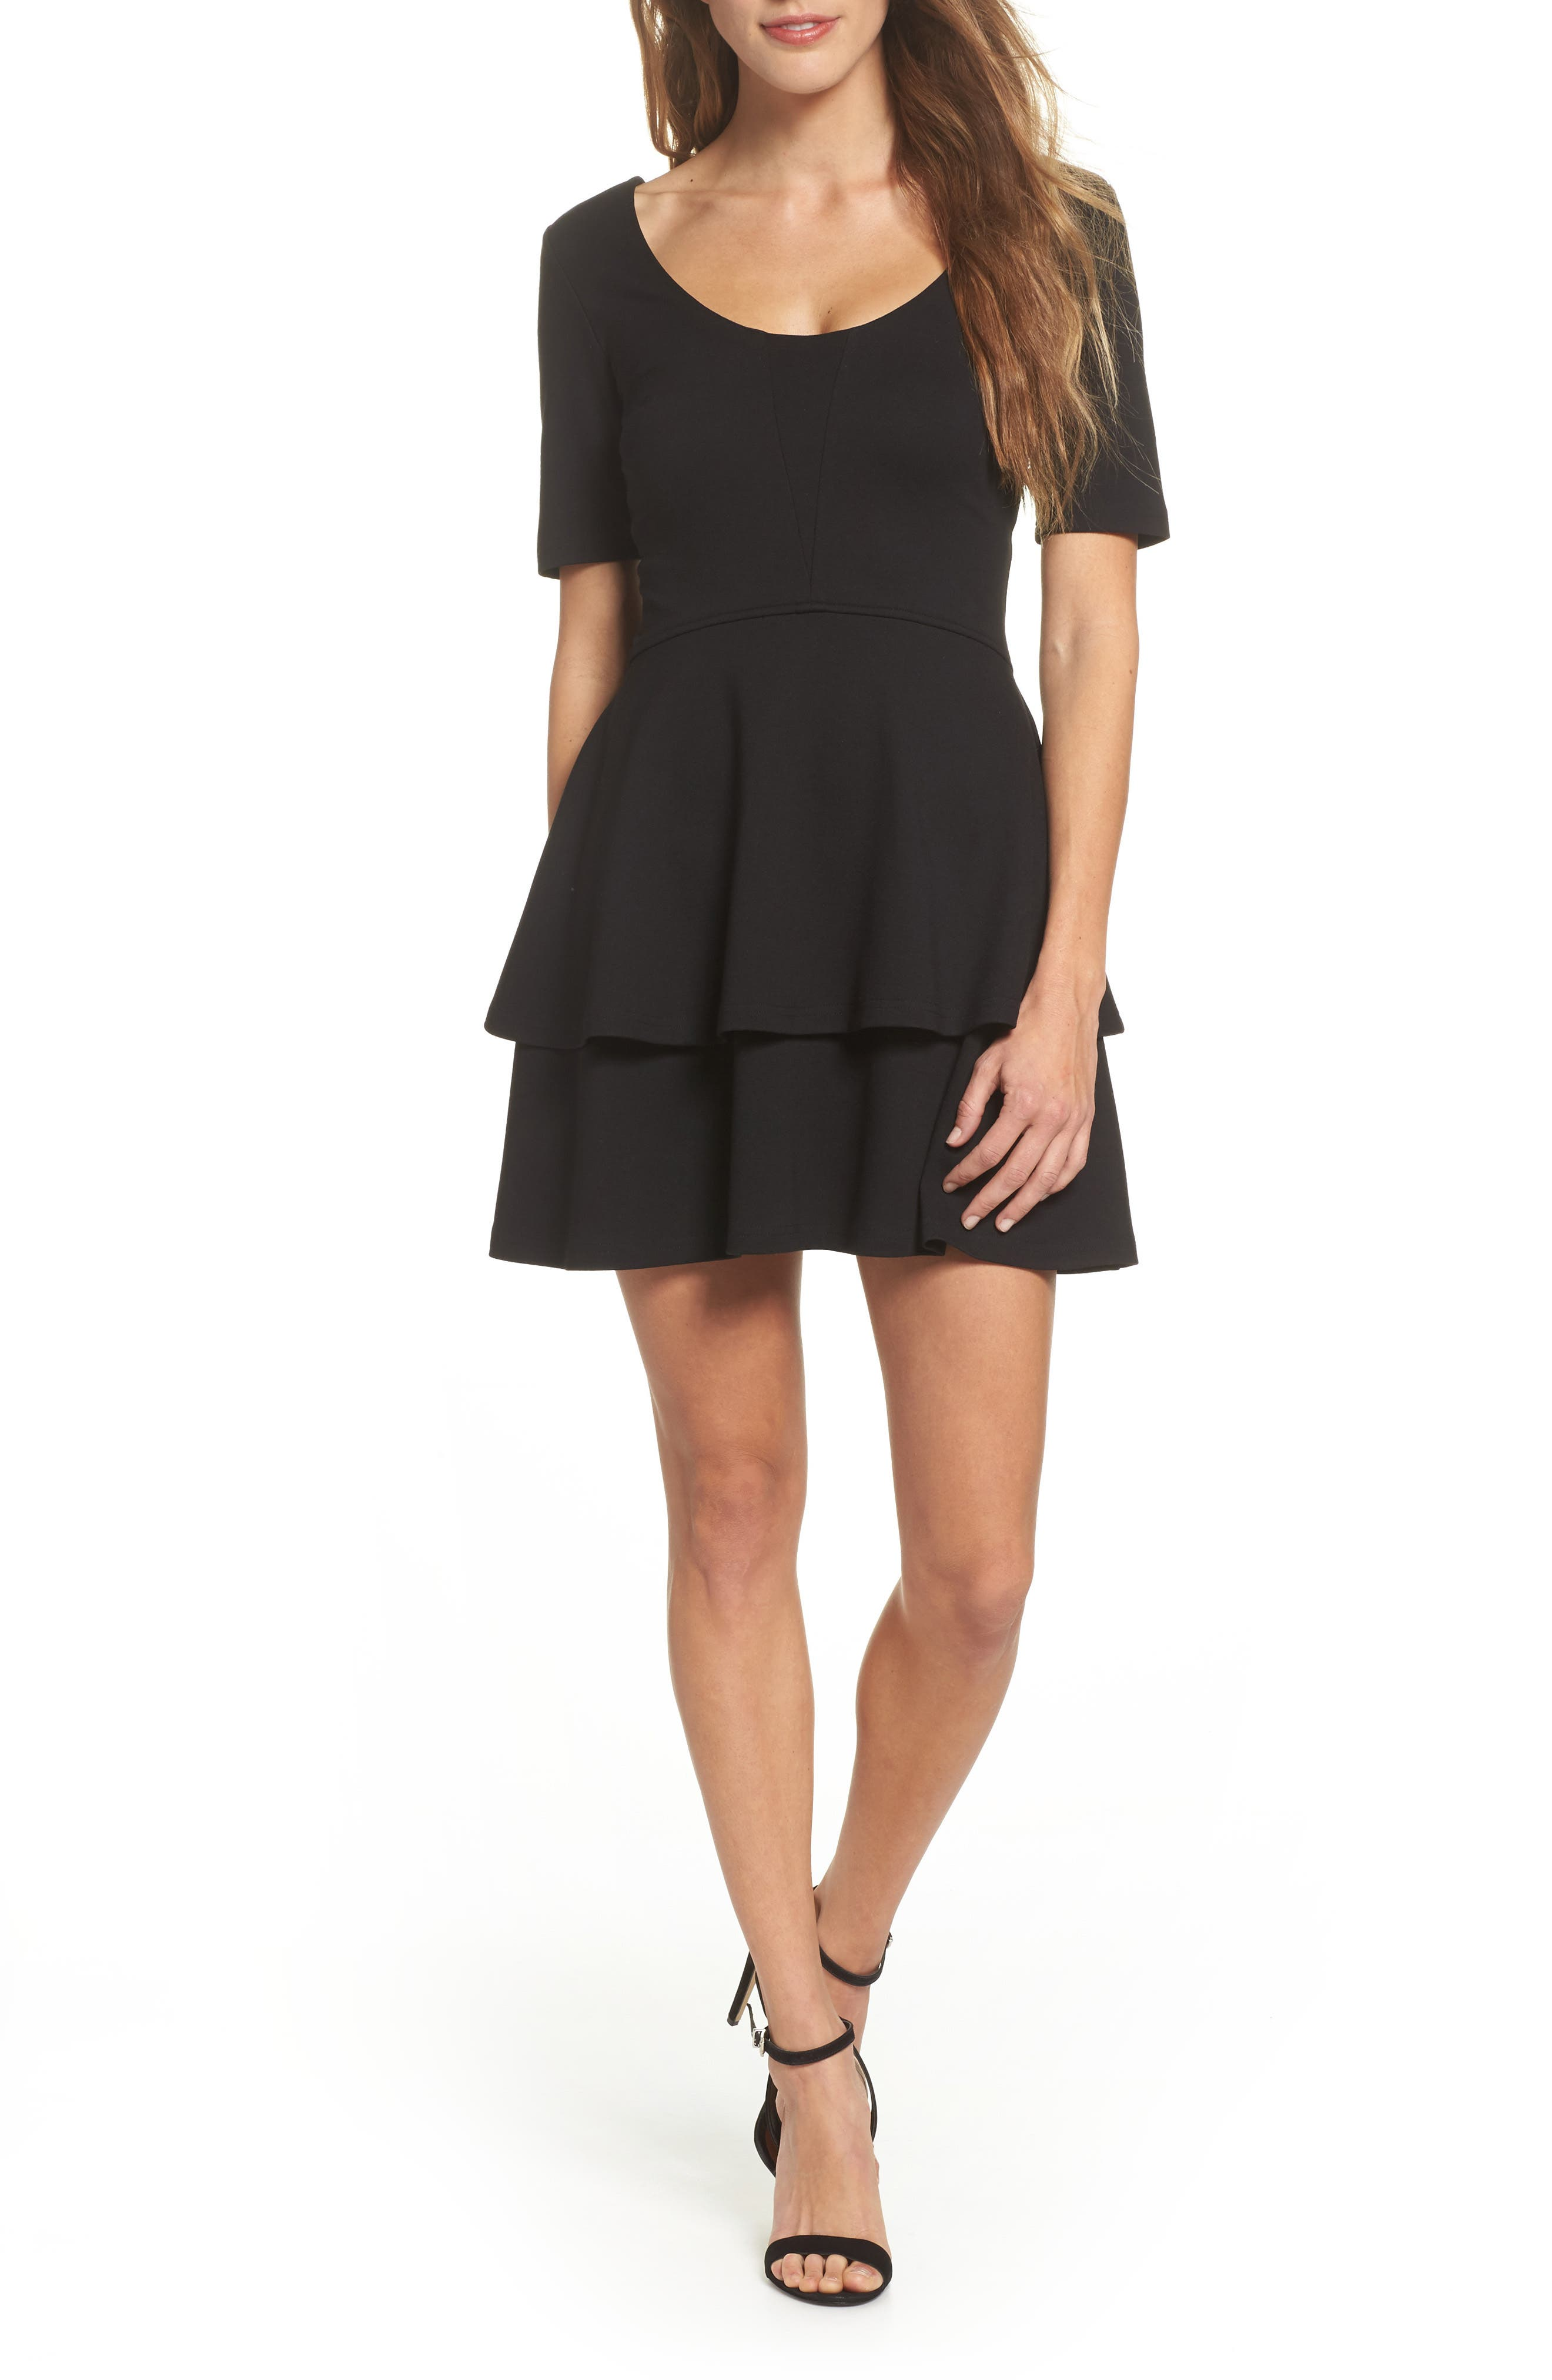 Isn't It Sweet Fit & Flare Dress,                         Main,                         color, 001